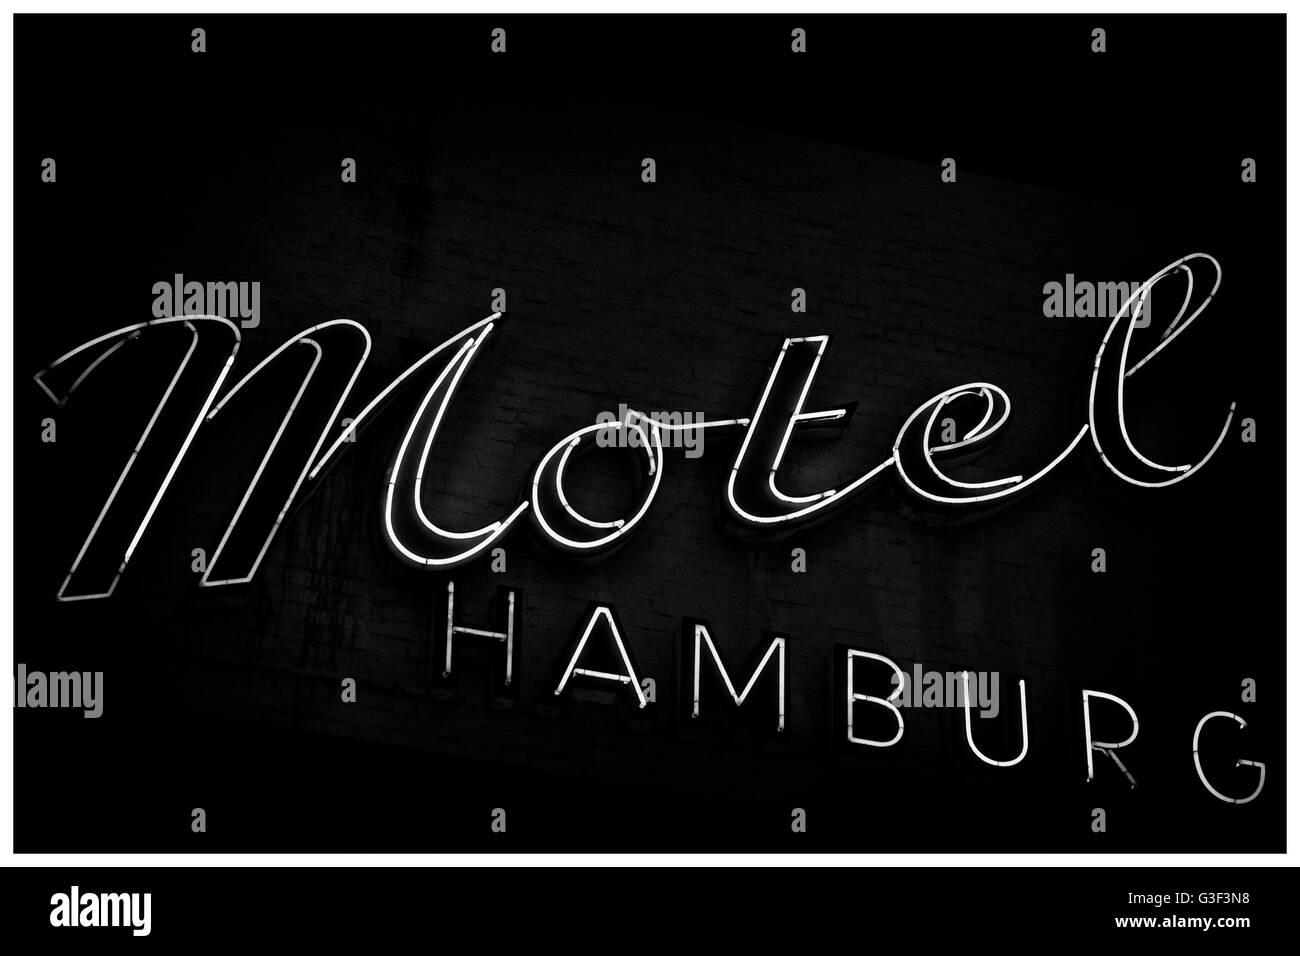 Motel Hamburg sign in Hamburg, Germany - Stock Image